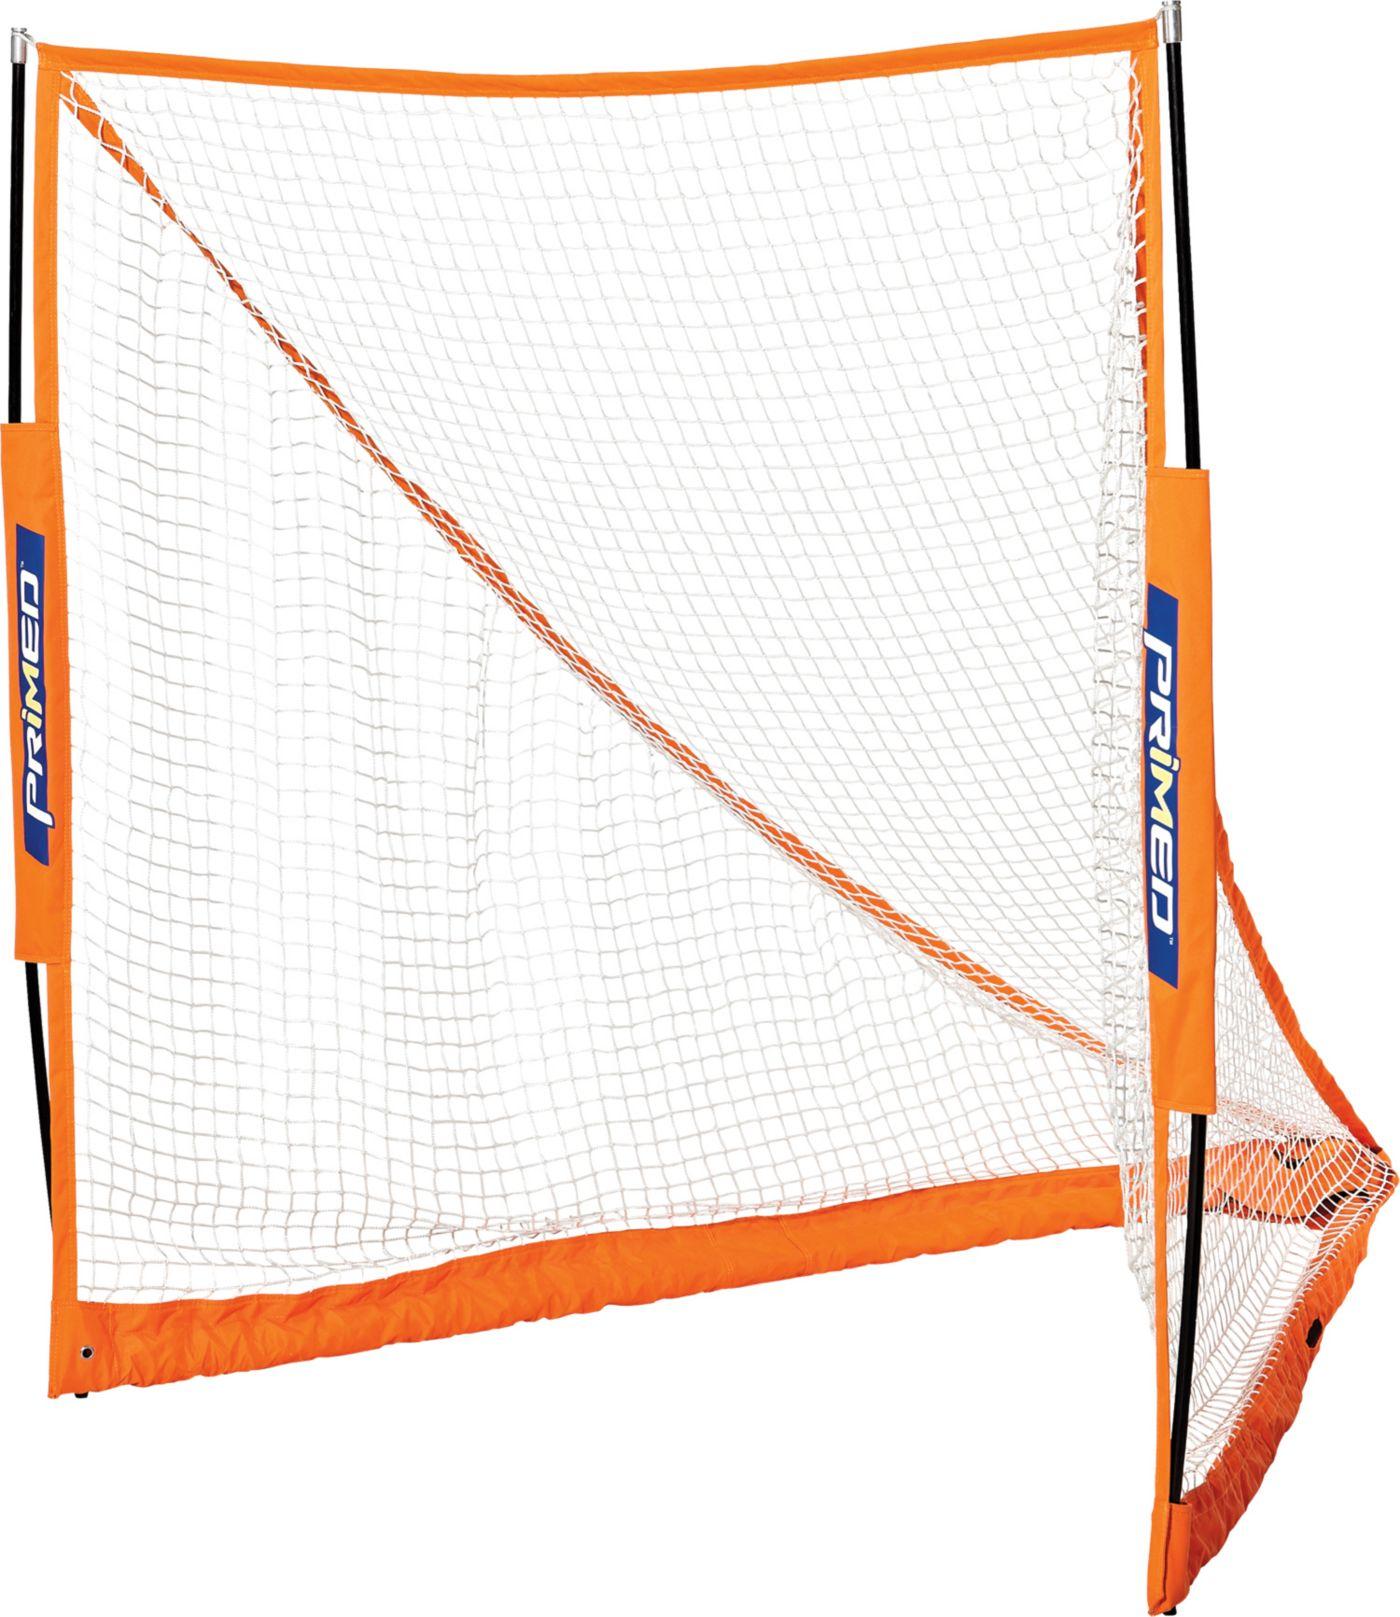 PRIMED 4' x 4' Instant Lacrosse Goal